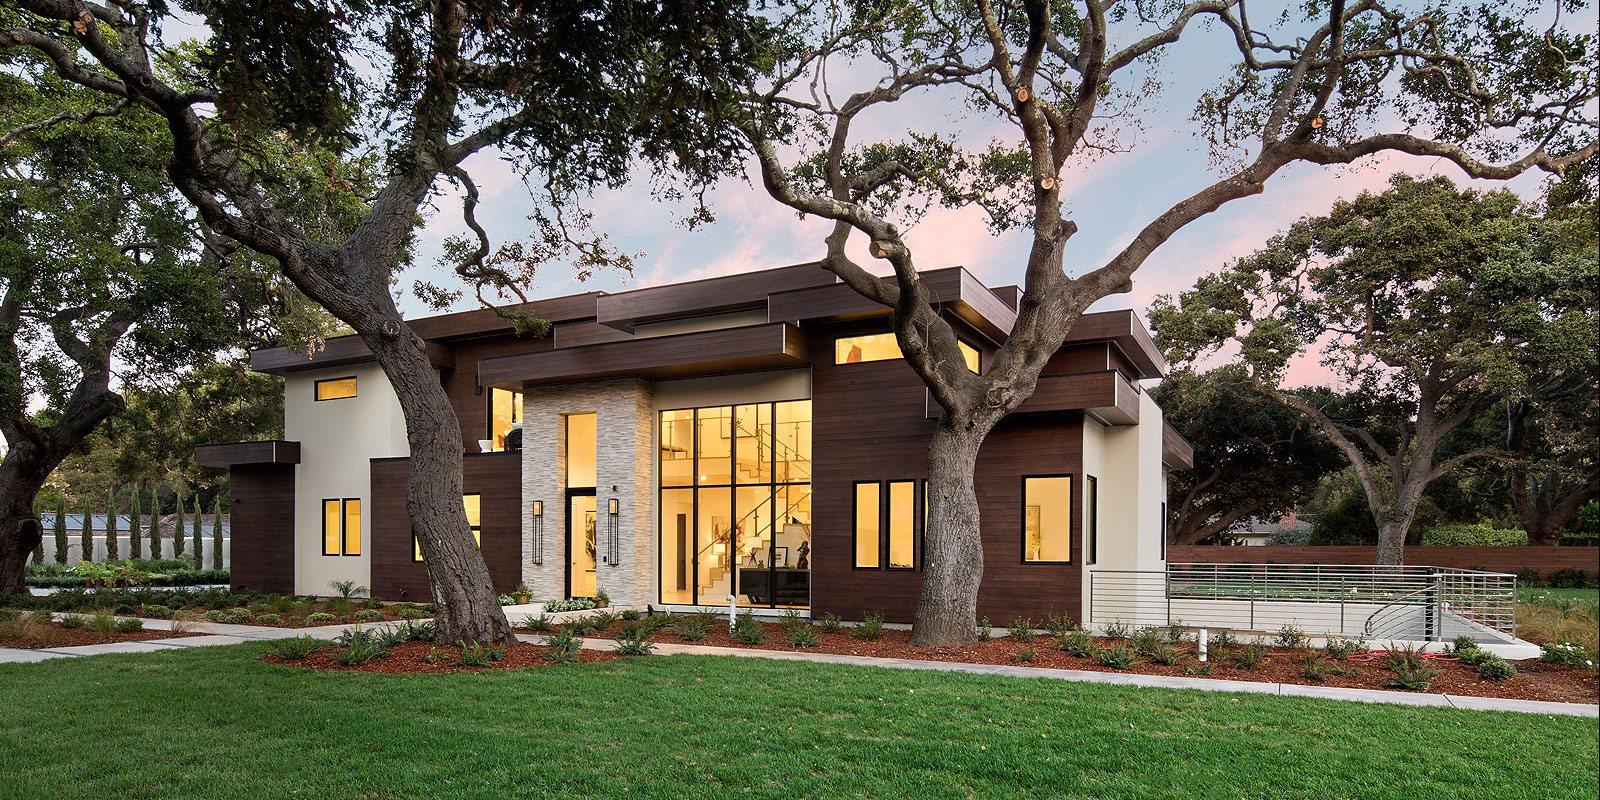 Beautiful home at Encinal Avenue, Atherton, California.